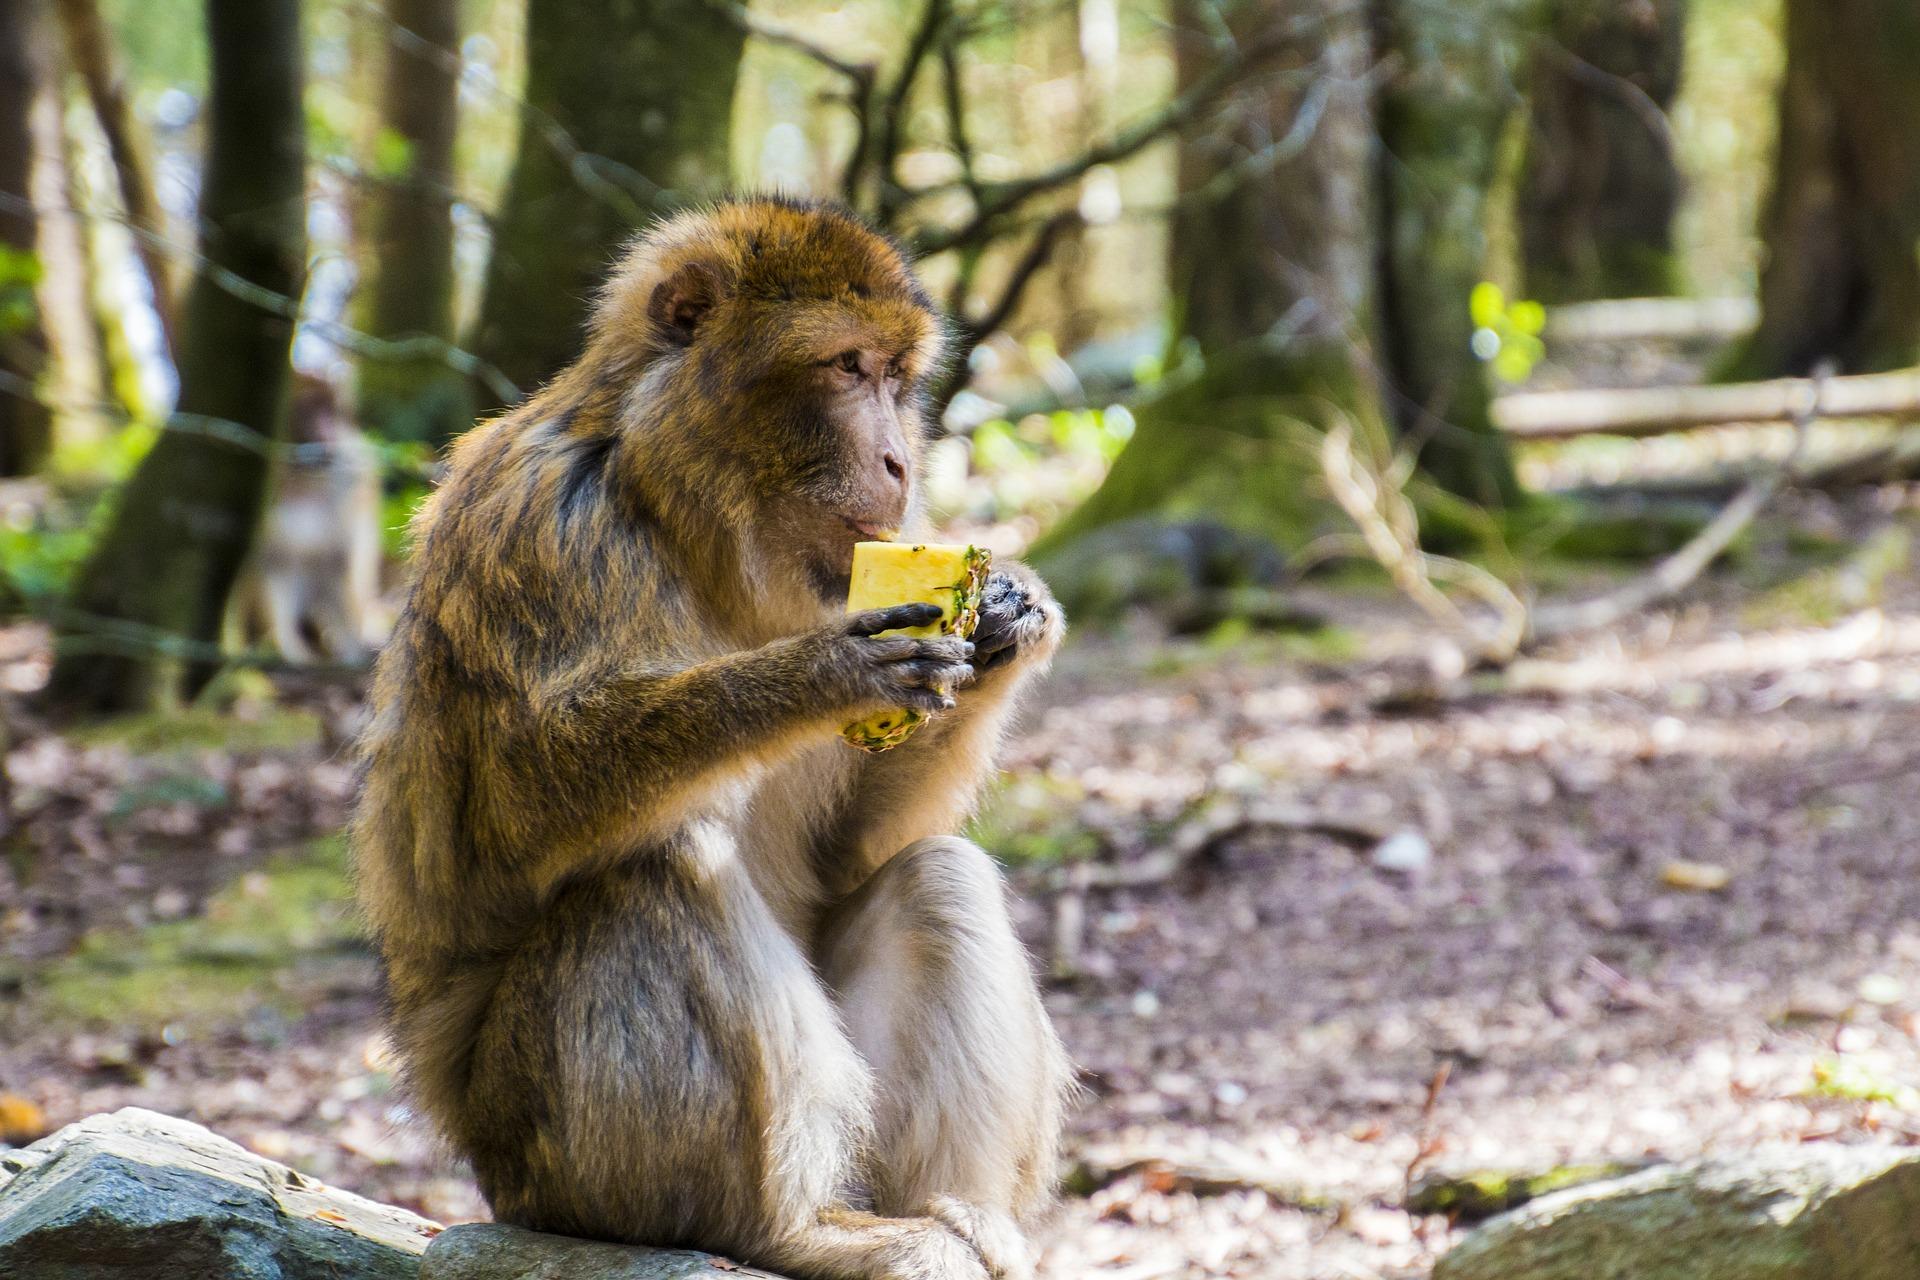 Ep 1: The drunken monkey